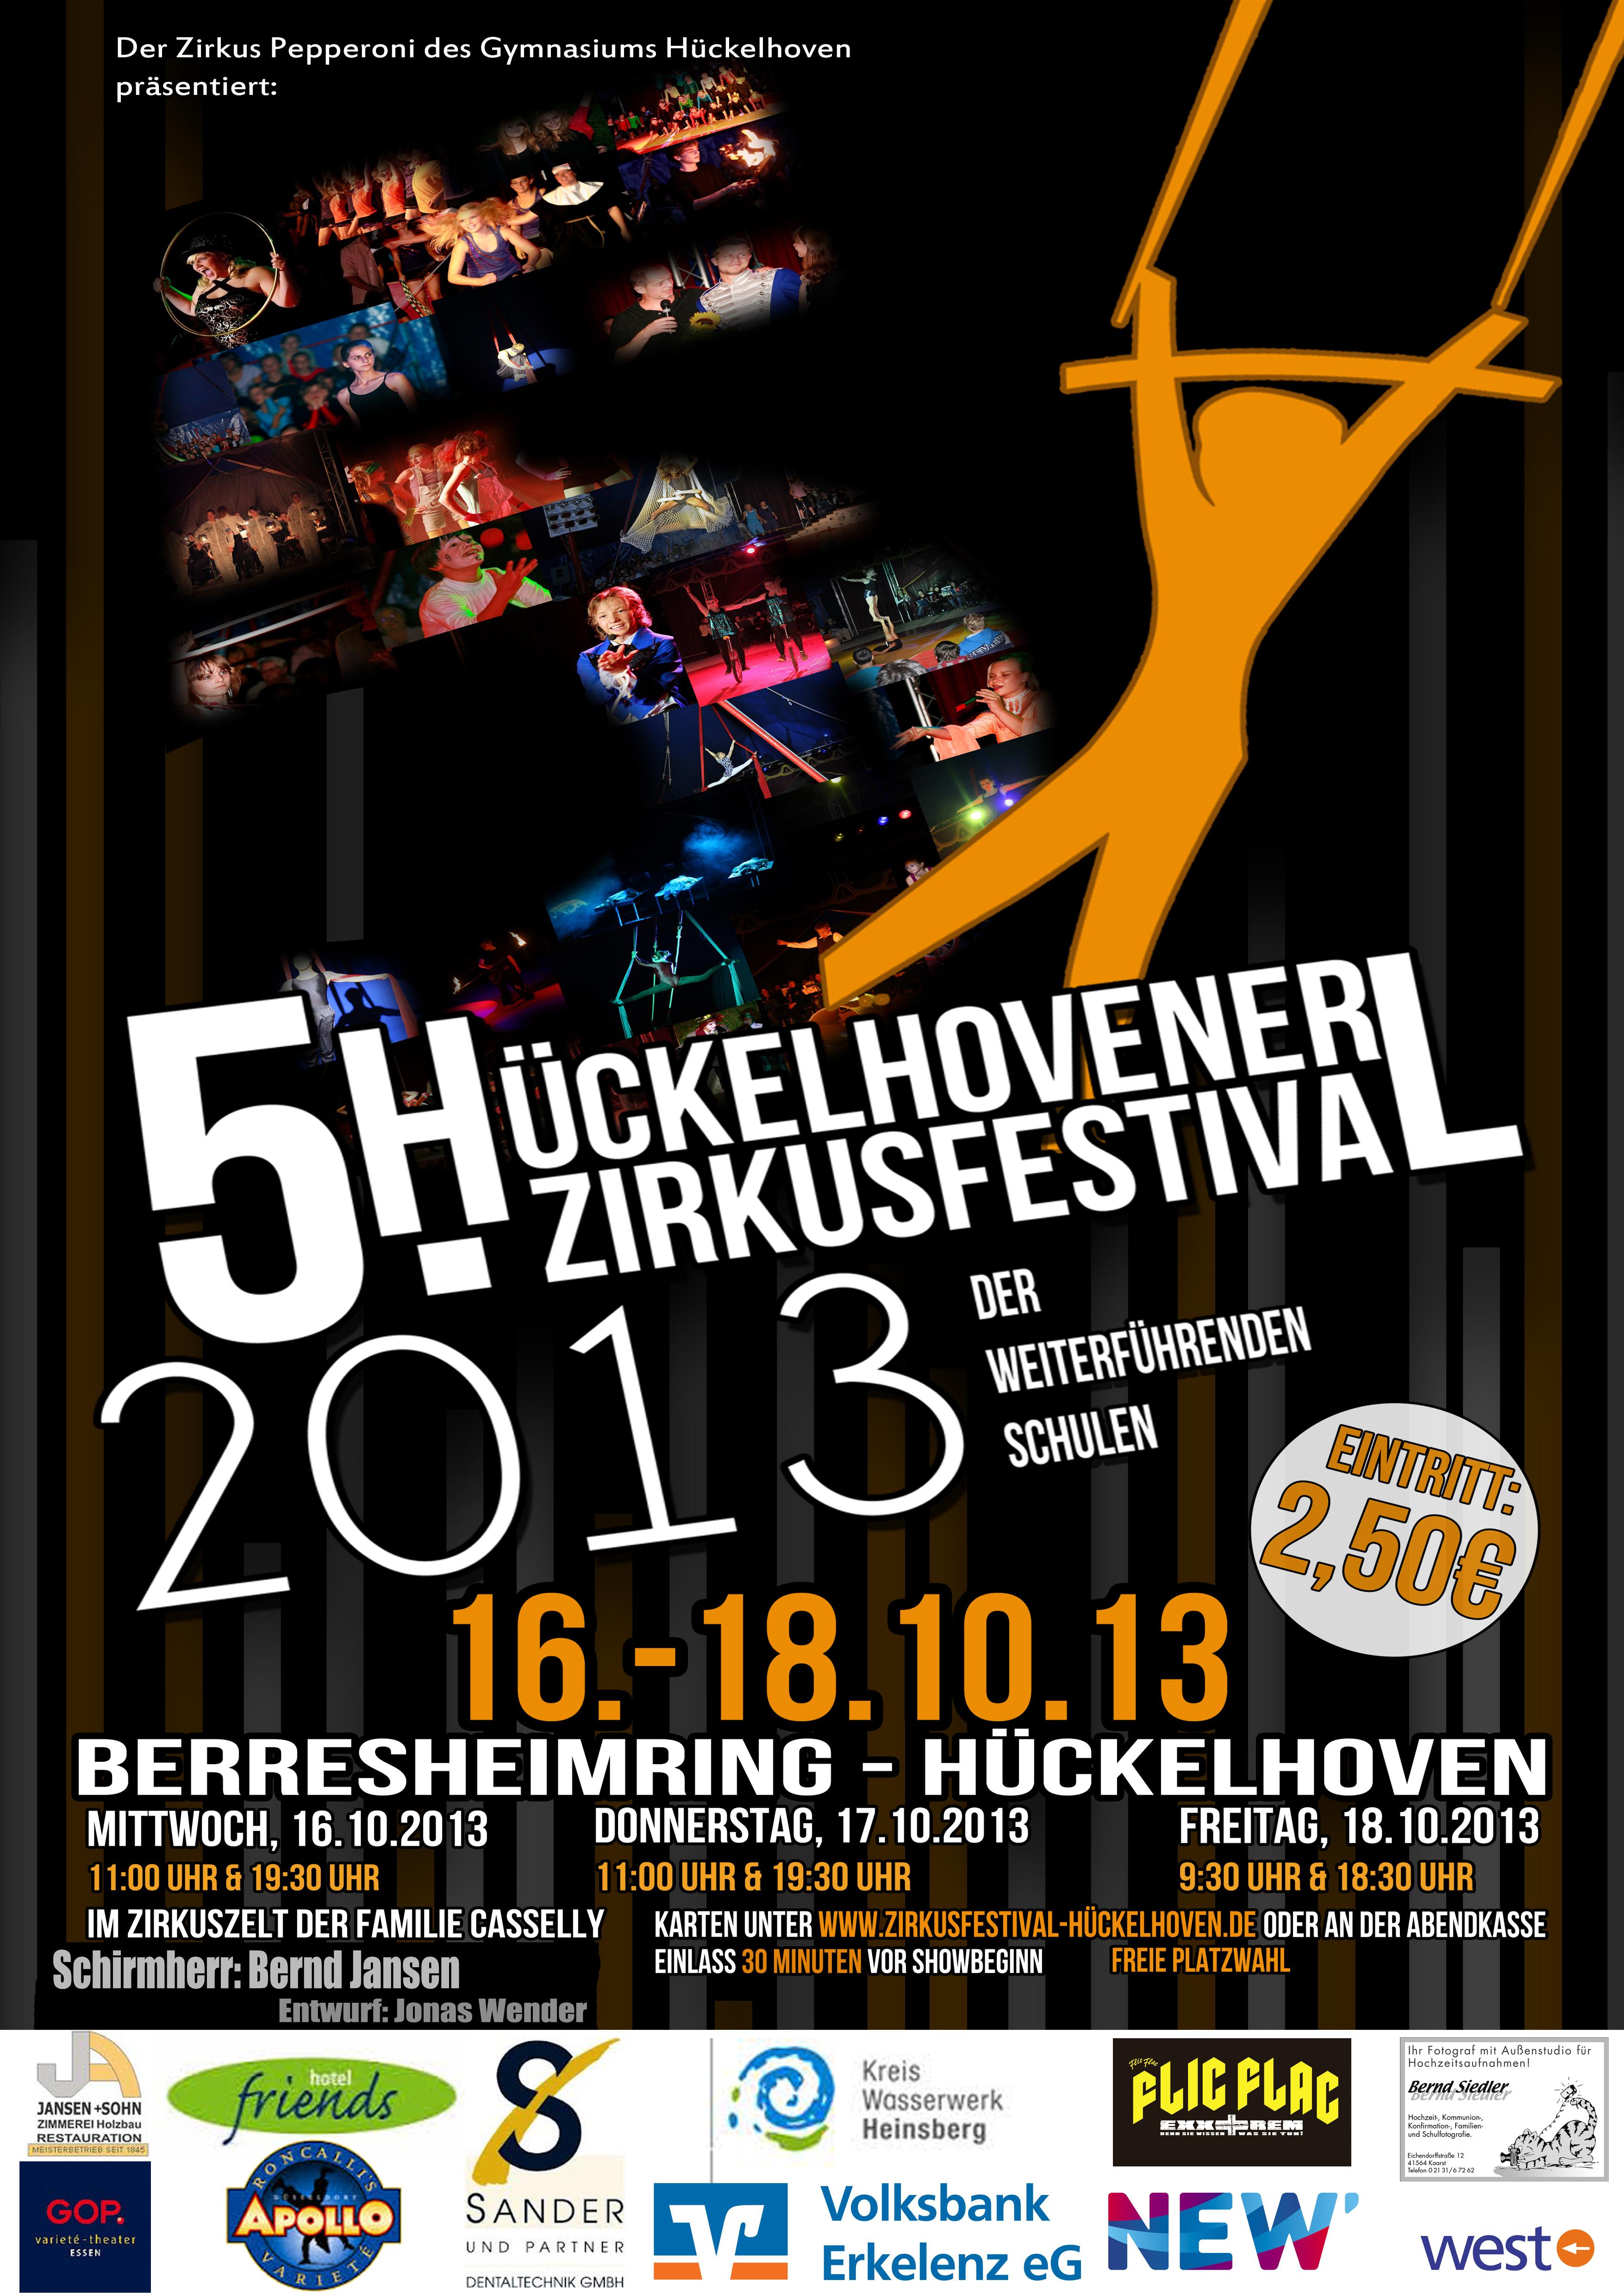 Zirkusfestival 2013 Offizielles Plakat